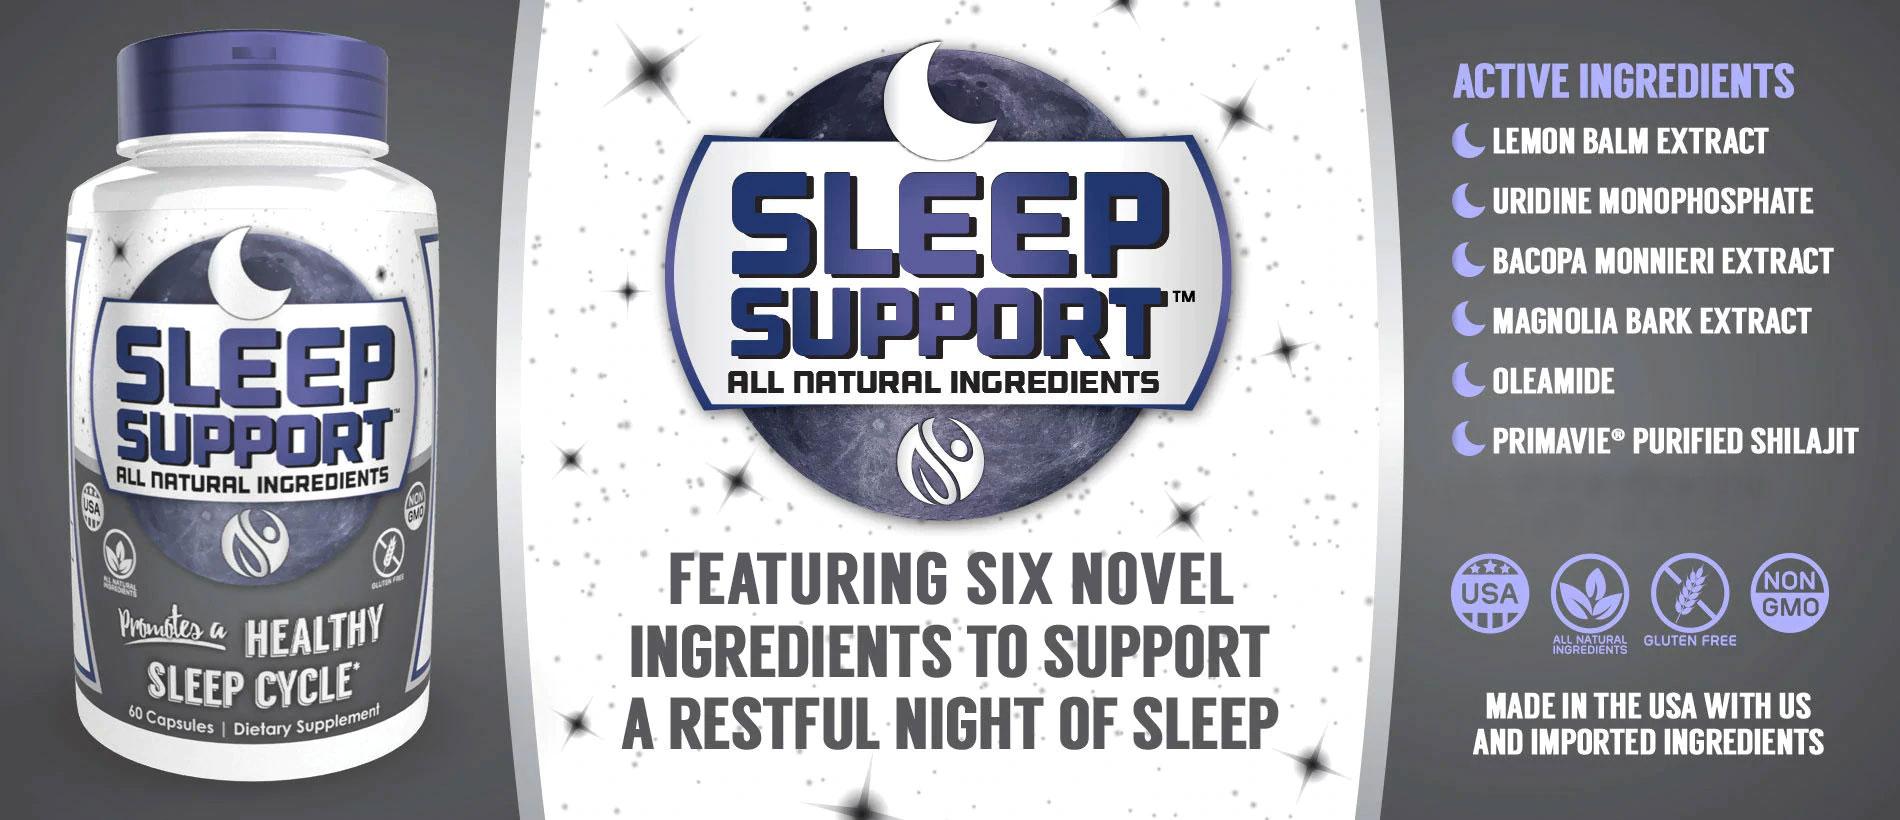 Sleep Support by Natrium Health